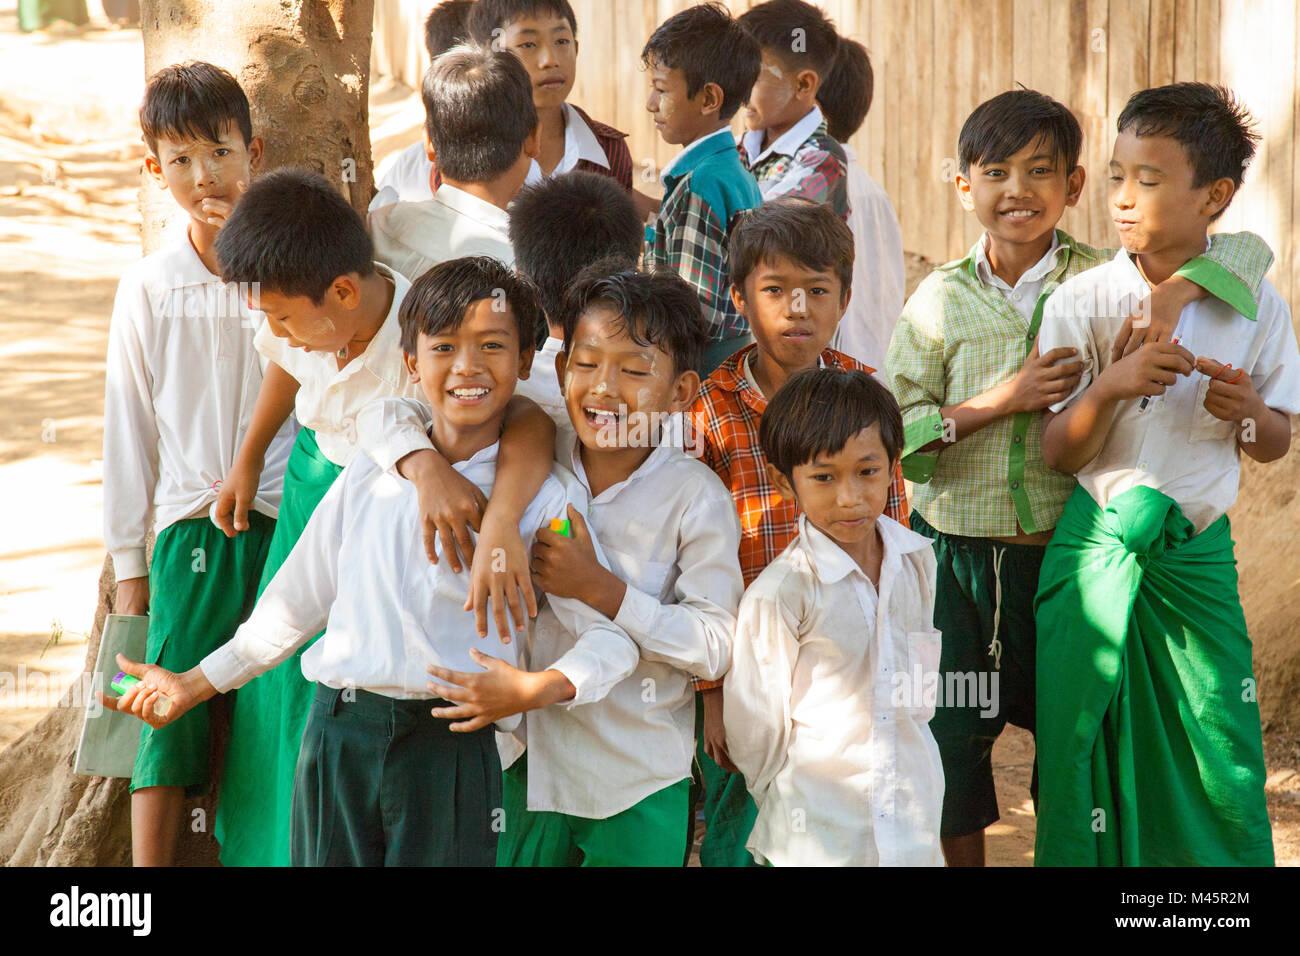 local burmese schoolchildren in Myanmar - Stock Image